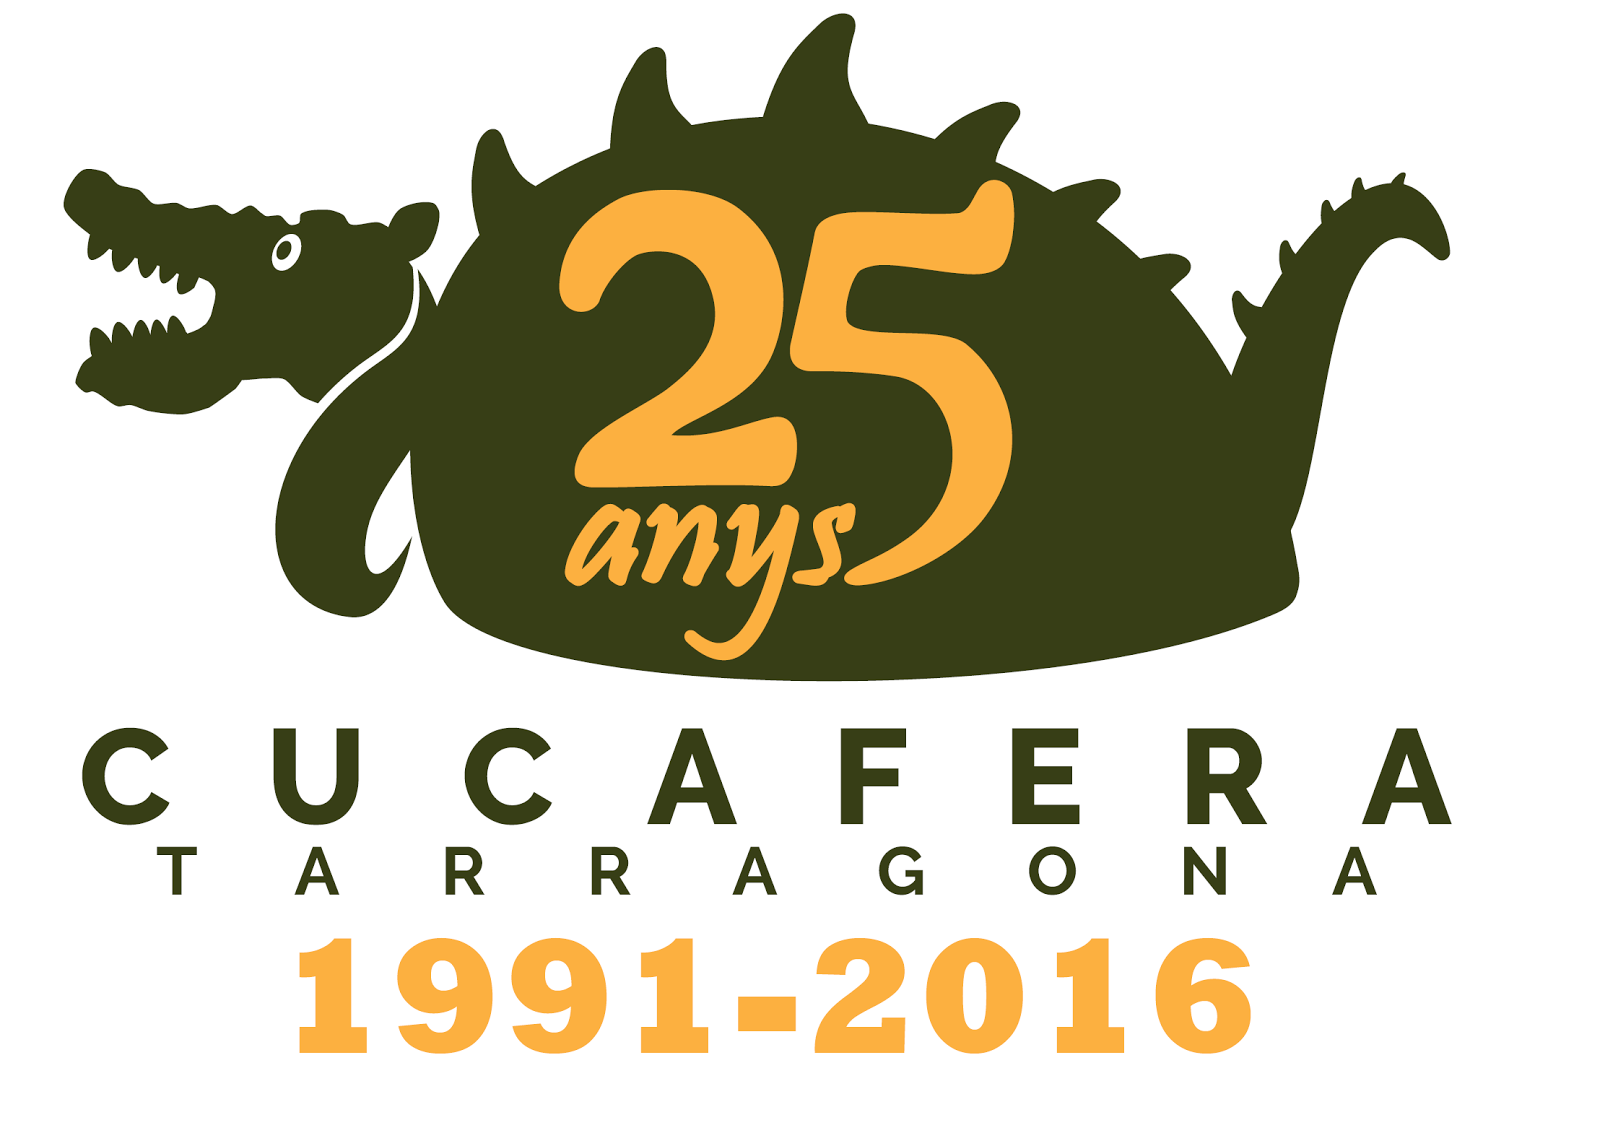 25è ANIVERSARI CUCAFERA TARRAGONA